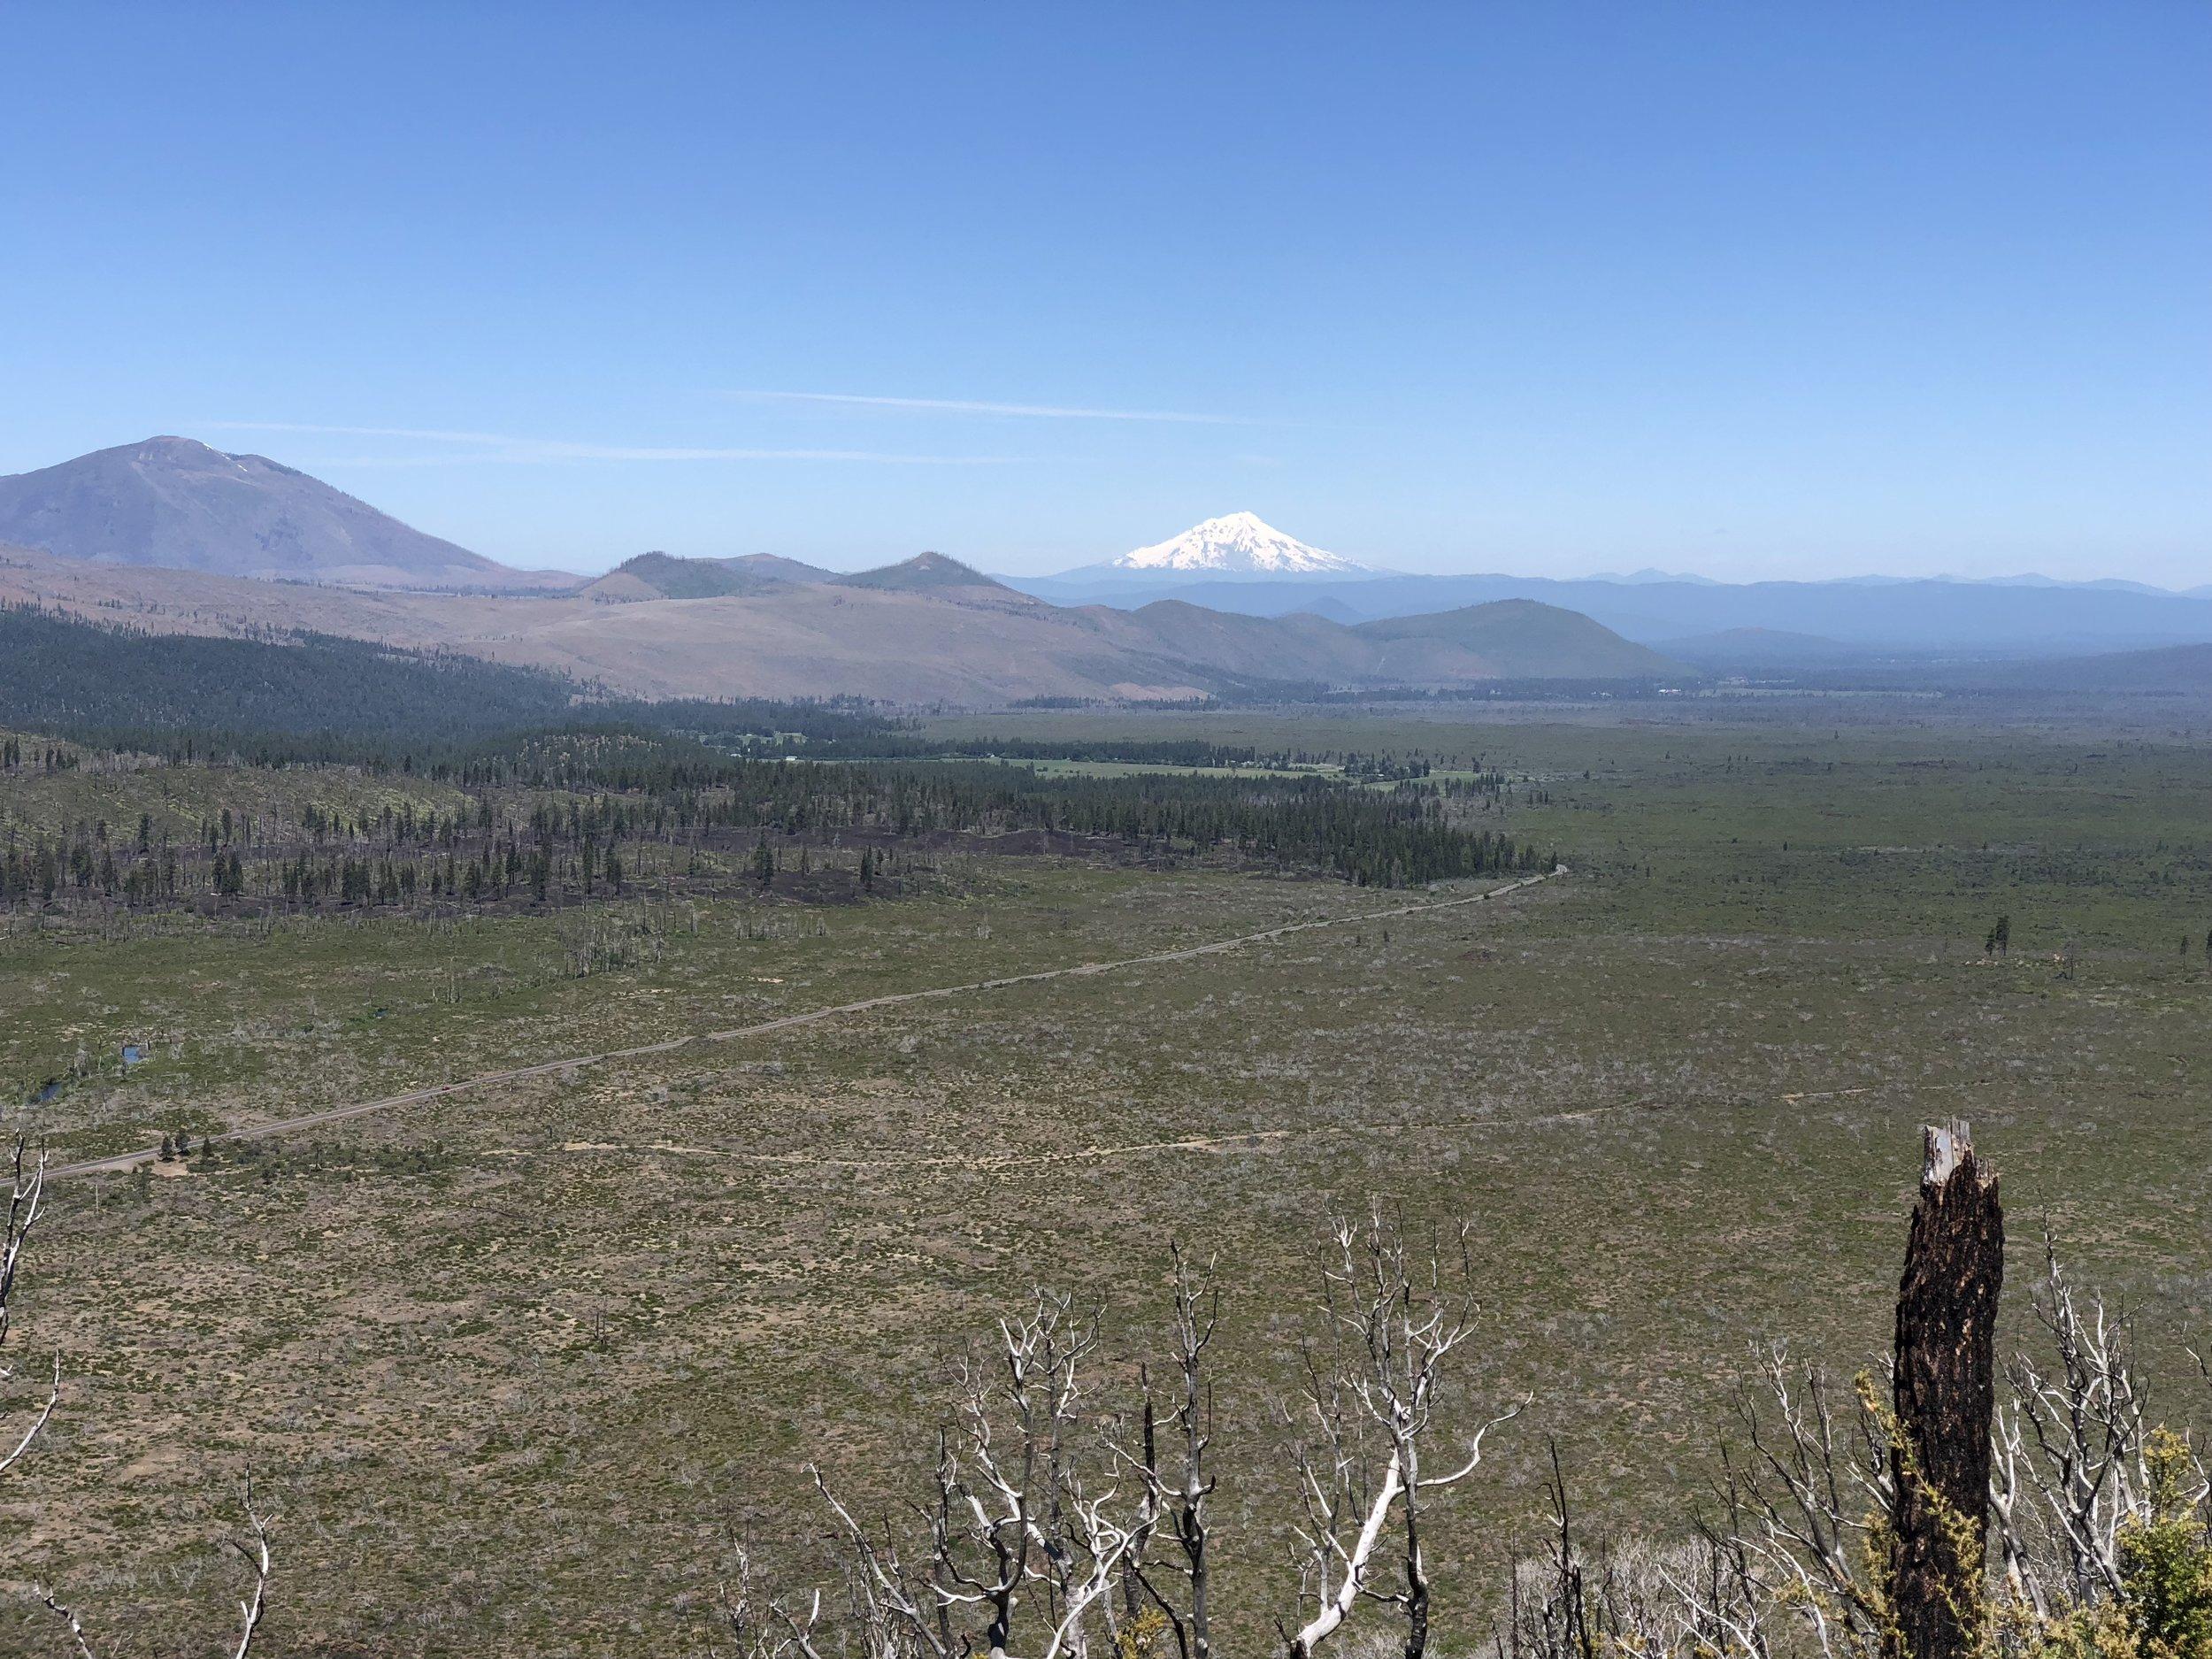 Mount Shasta saying hello and wishing safe travels.